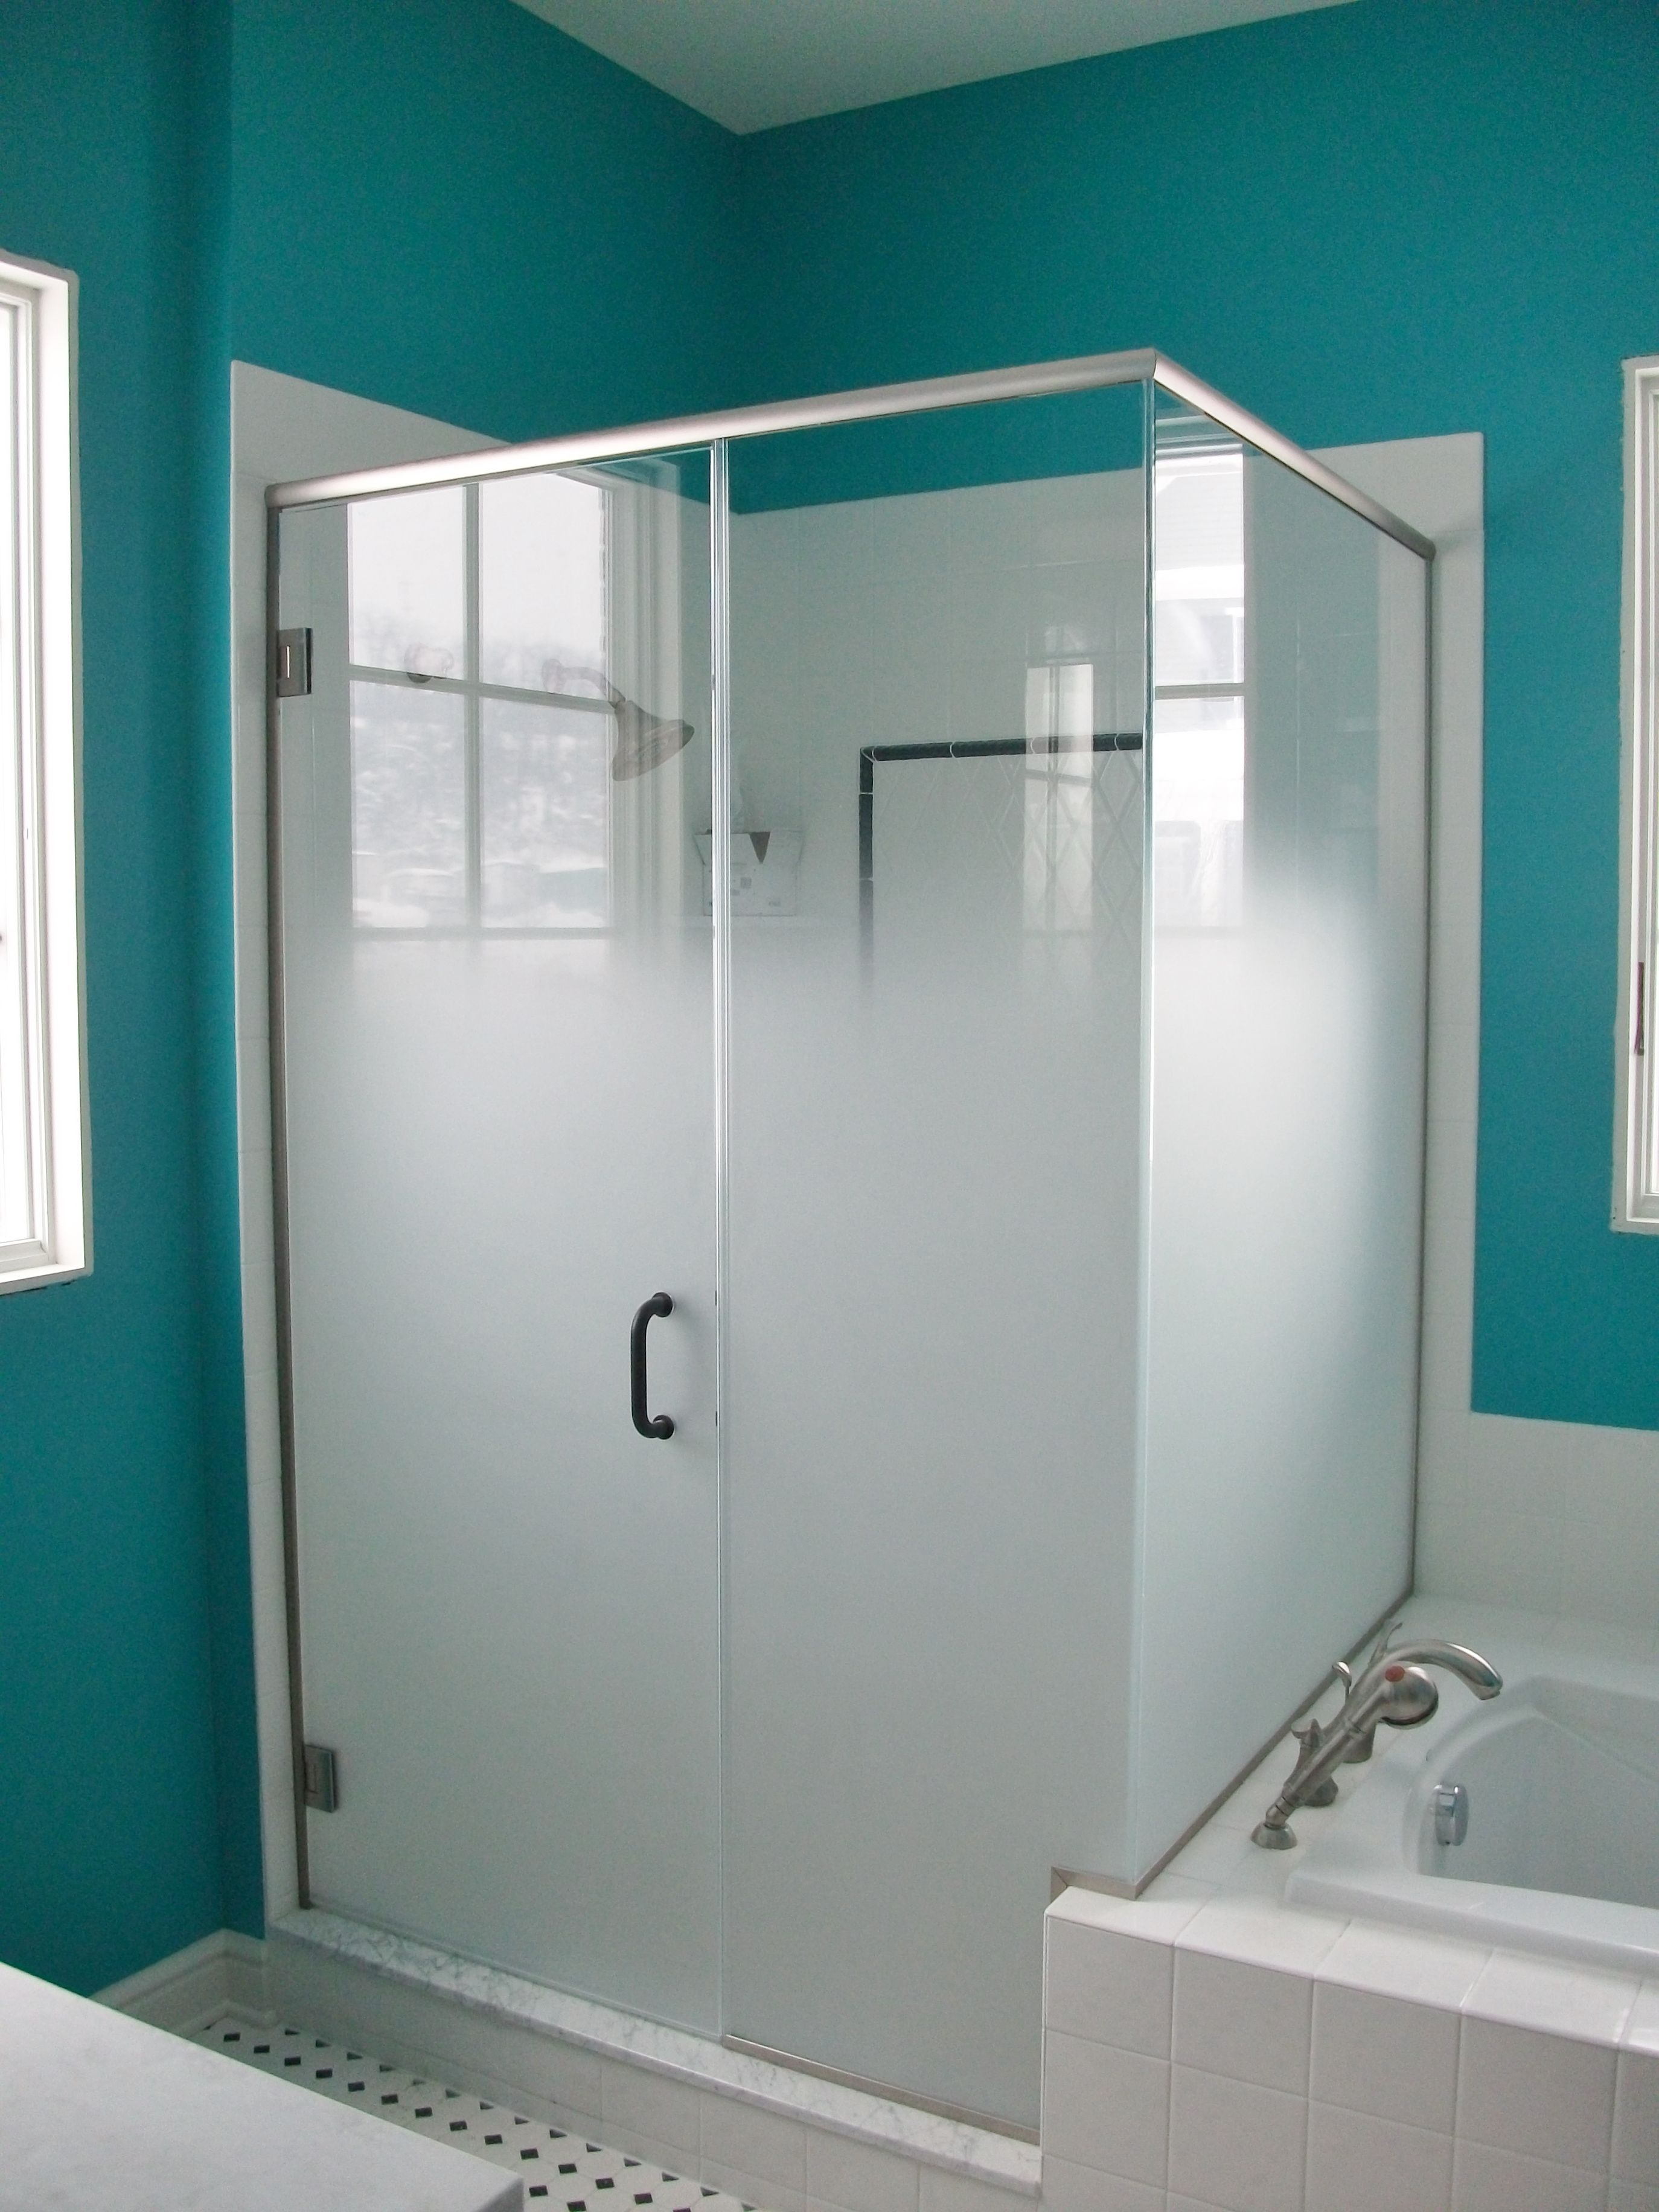 uncategorized exceptional bypass of concept sanibel vigo corner door size frameless full shower doors x glass in for photos